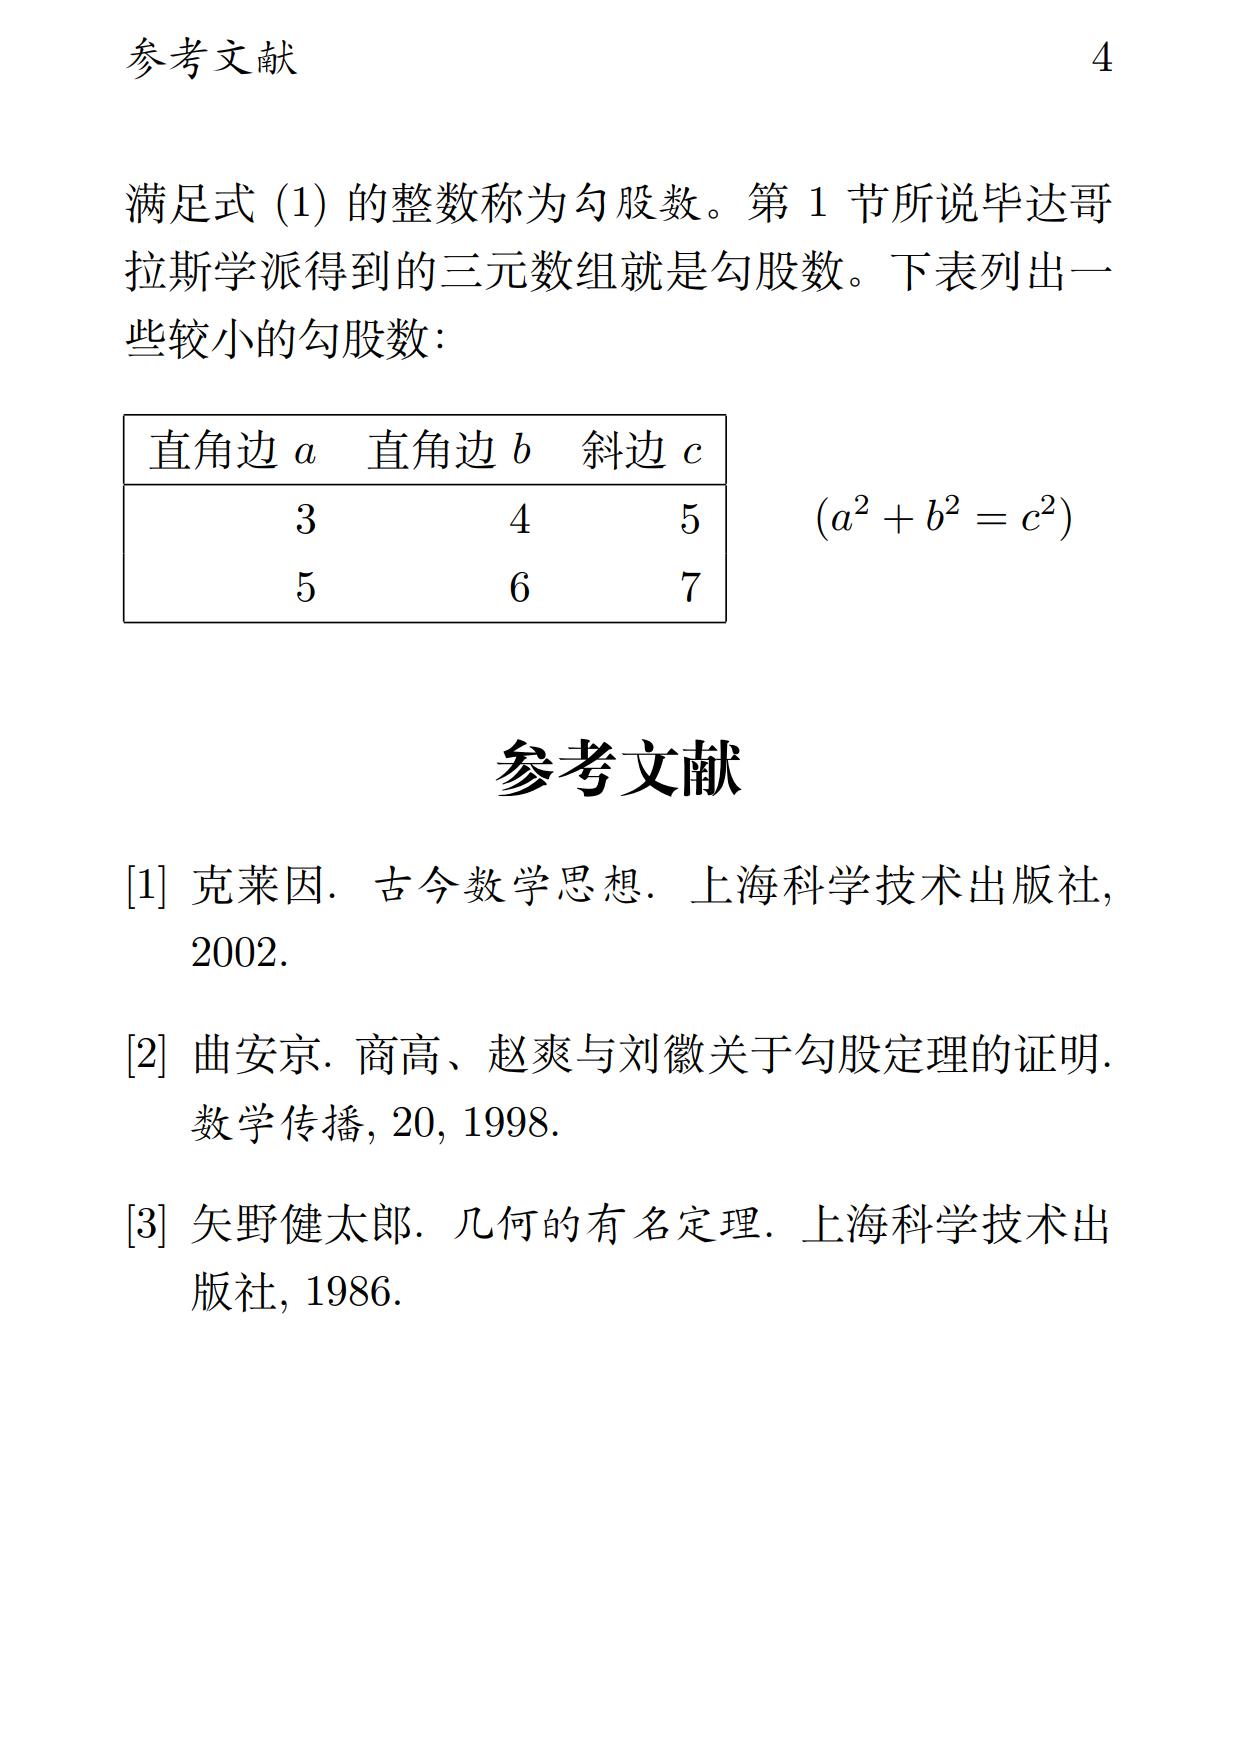 LaTeX入门(刘海洋)杂谈勾股定理实例